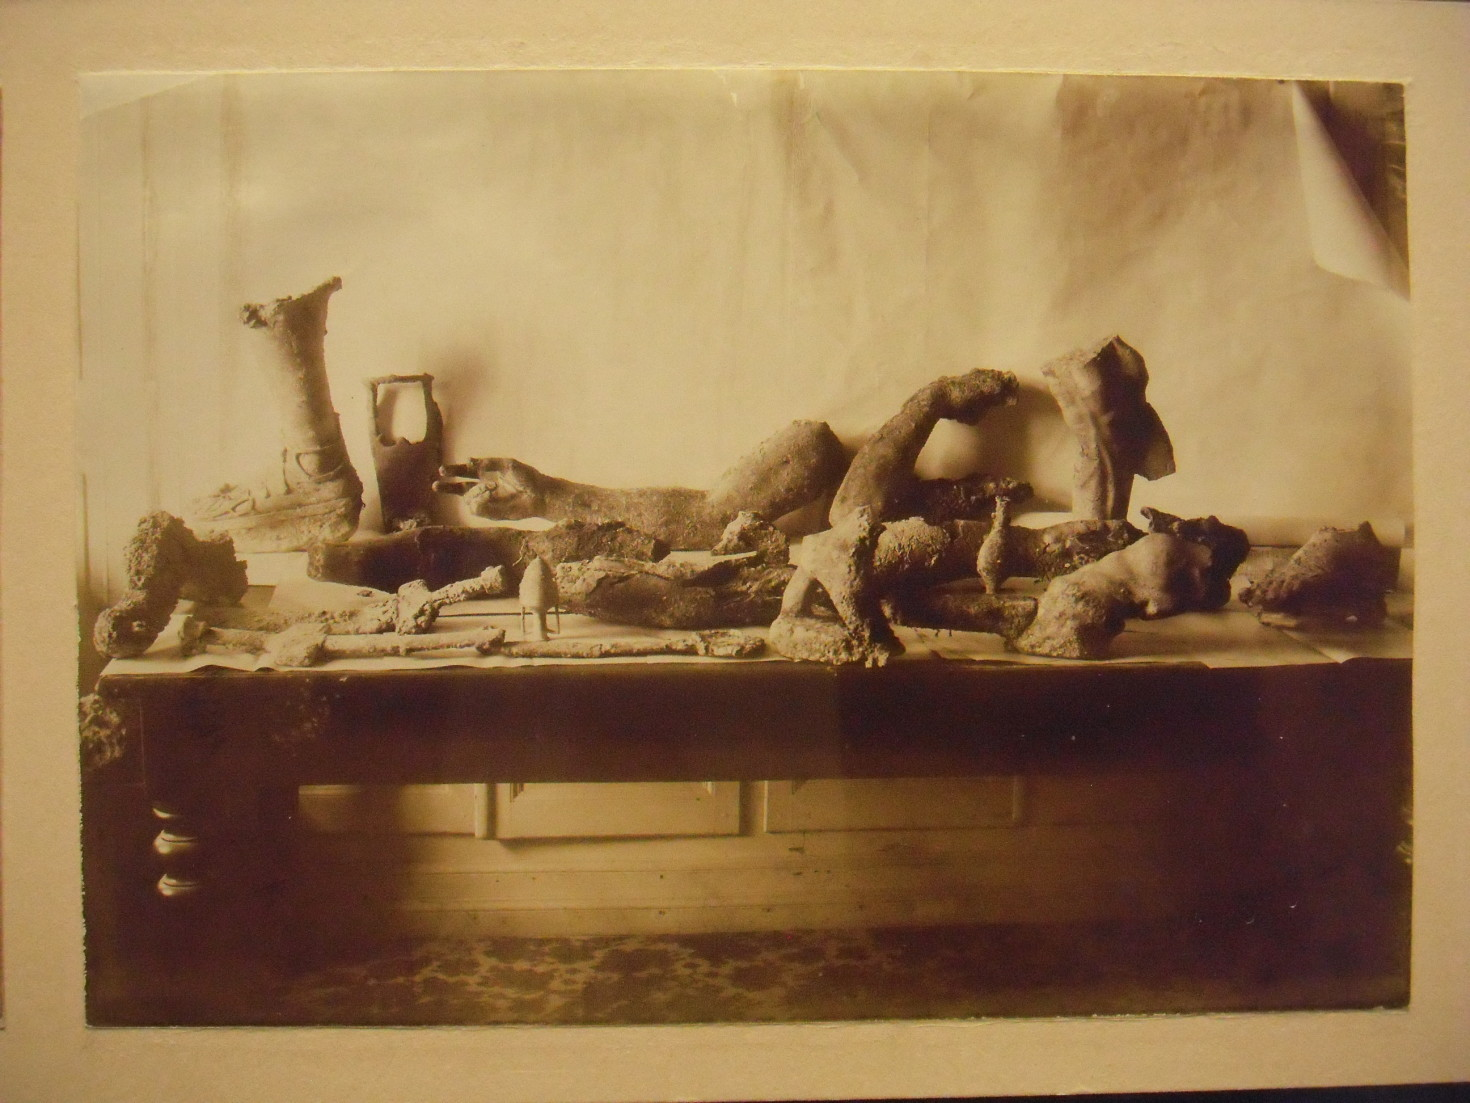 Becky Campbell, Curious Artefacts